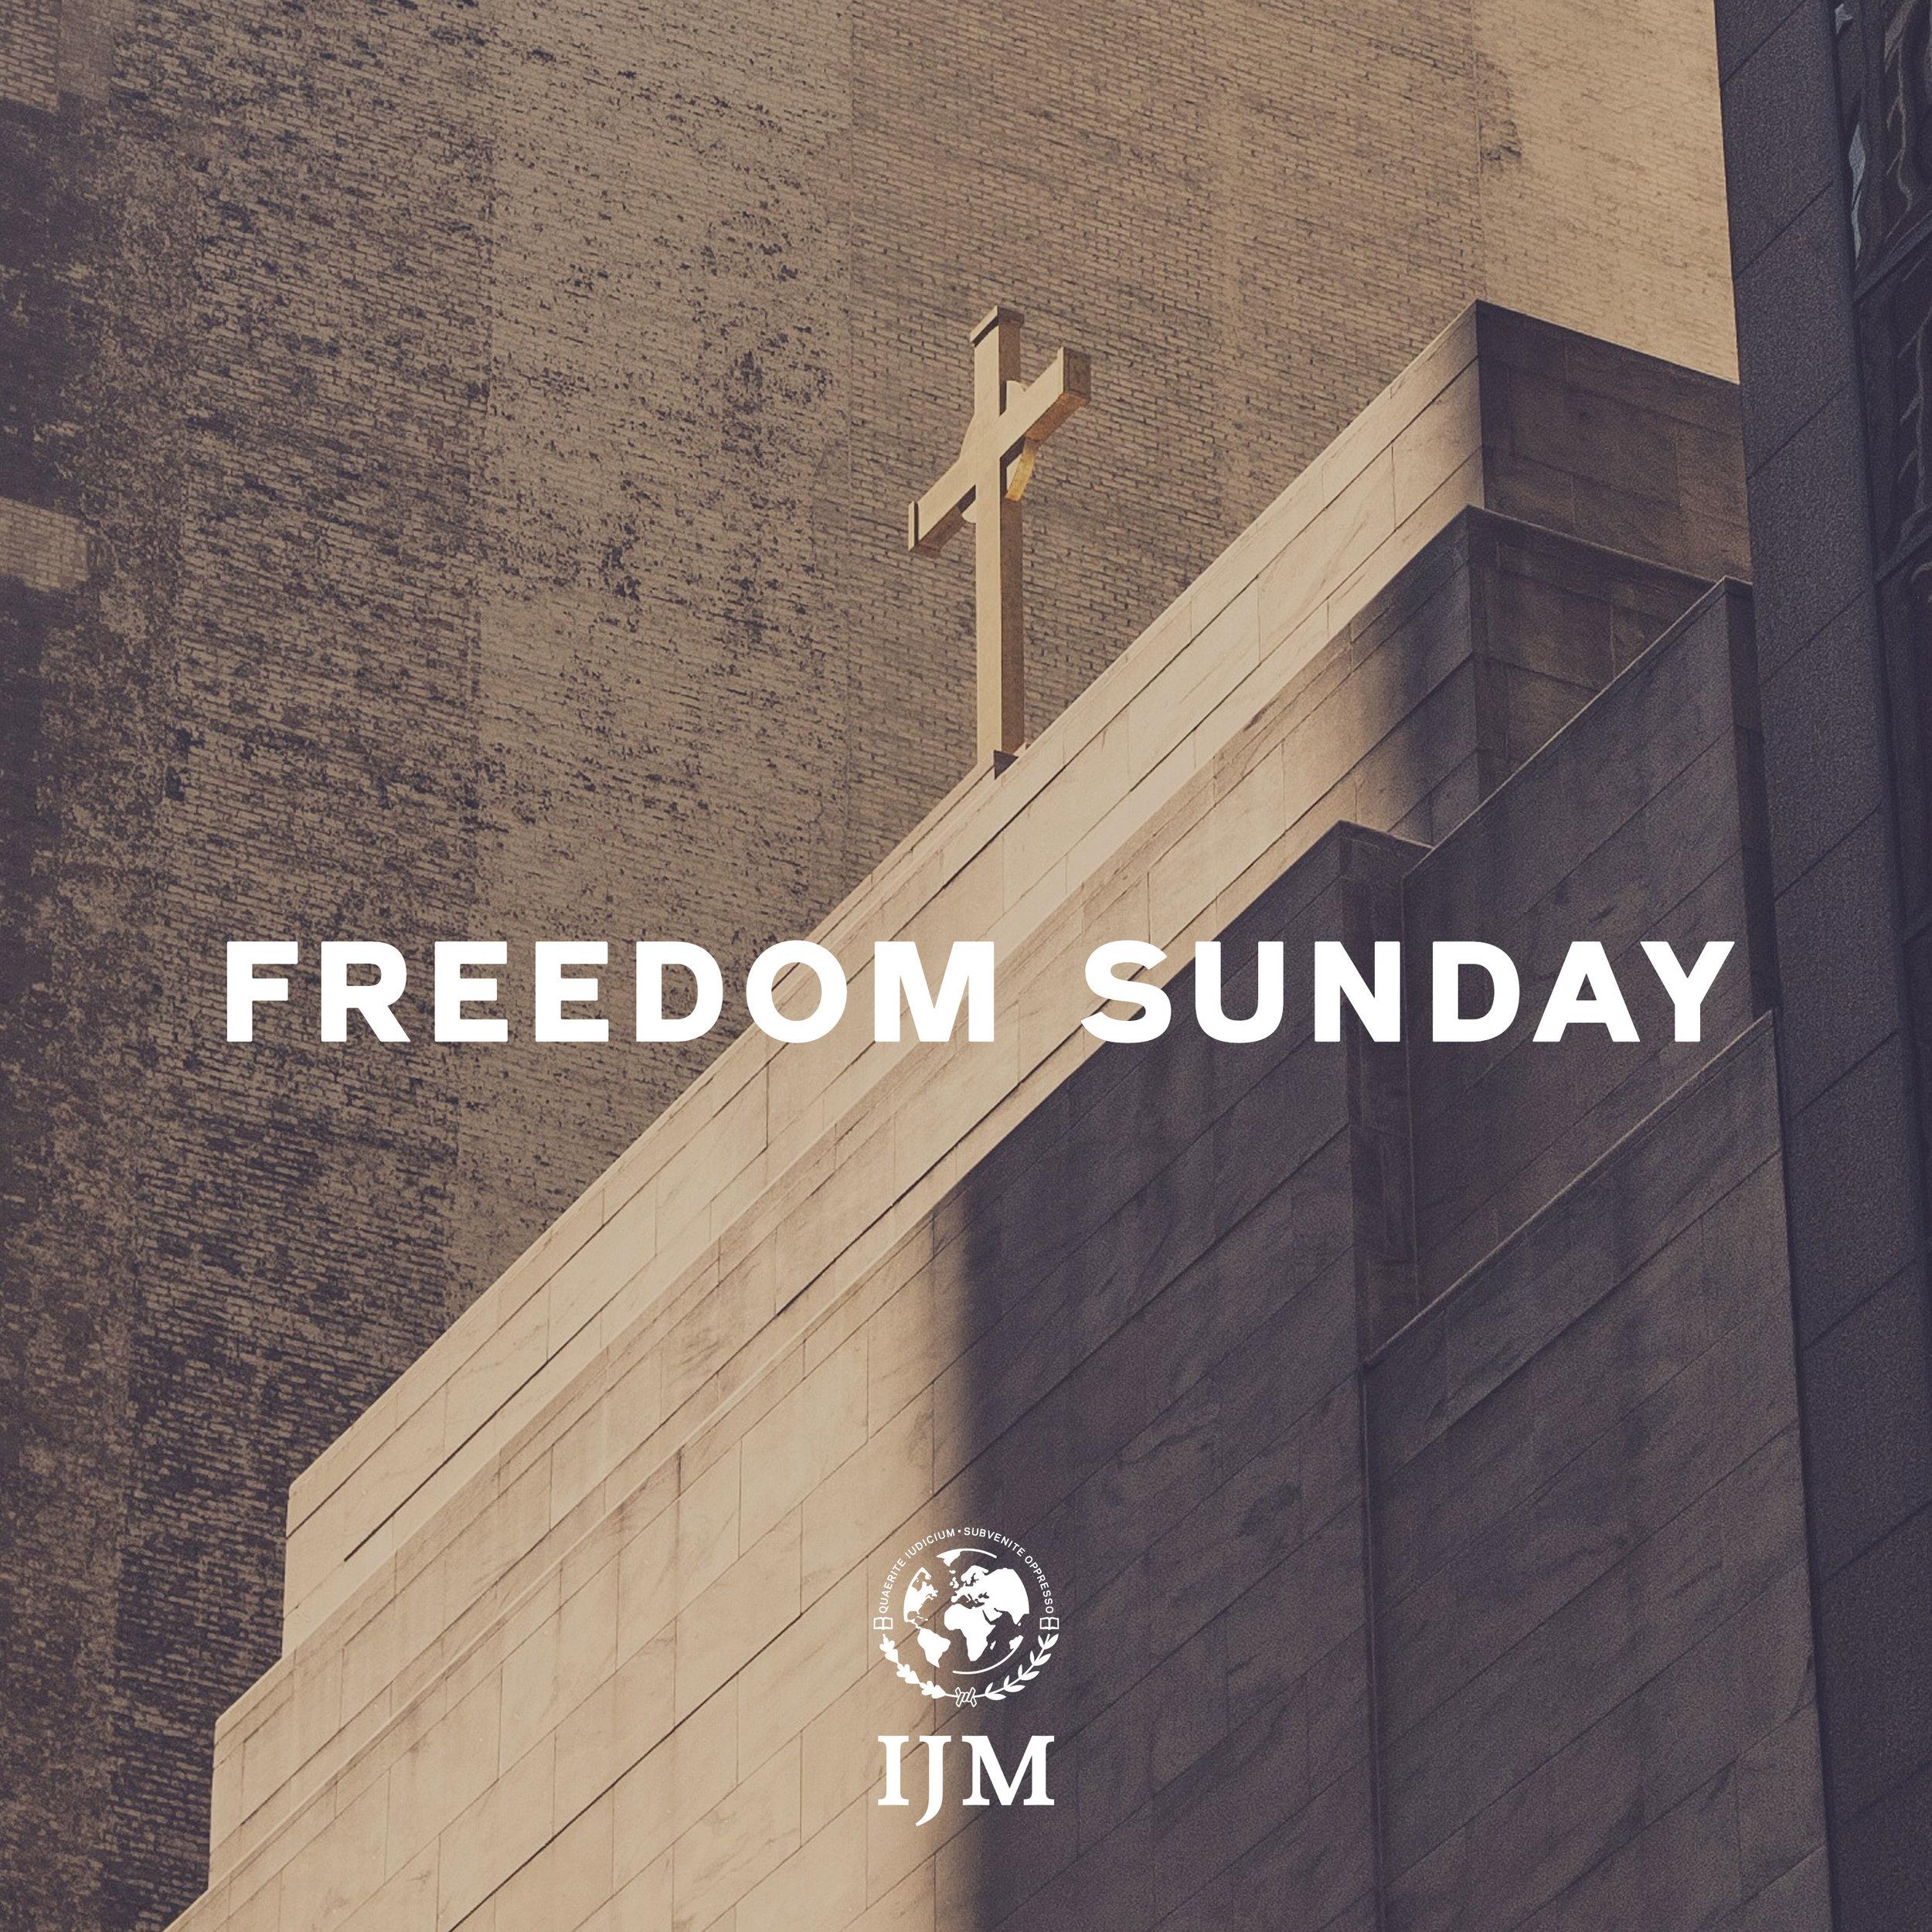 Freedom Sunday Social Media Graphic - No Date 2.jpg